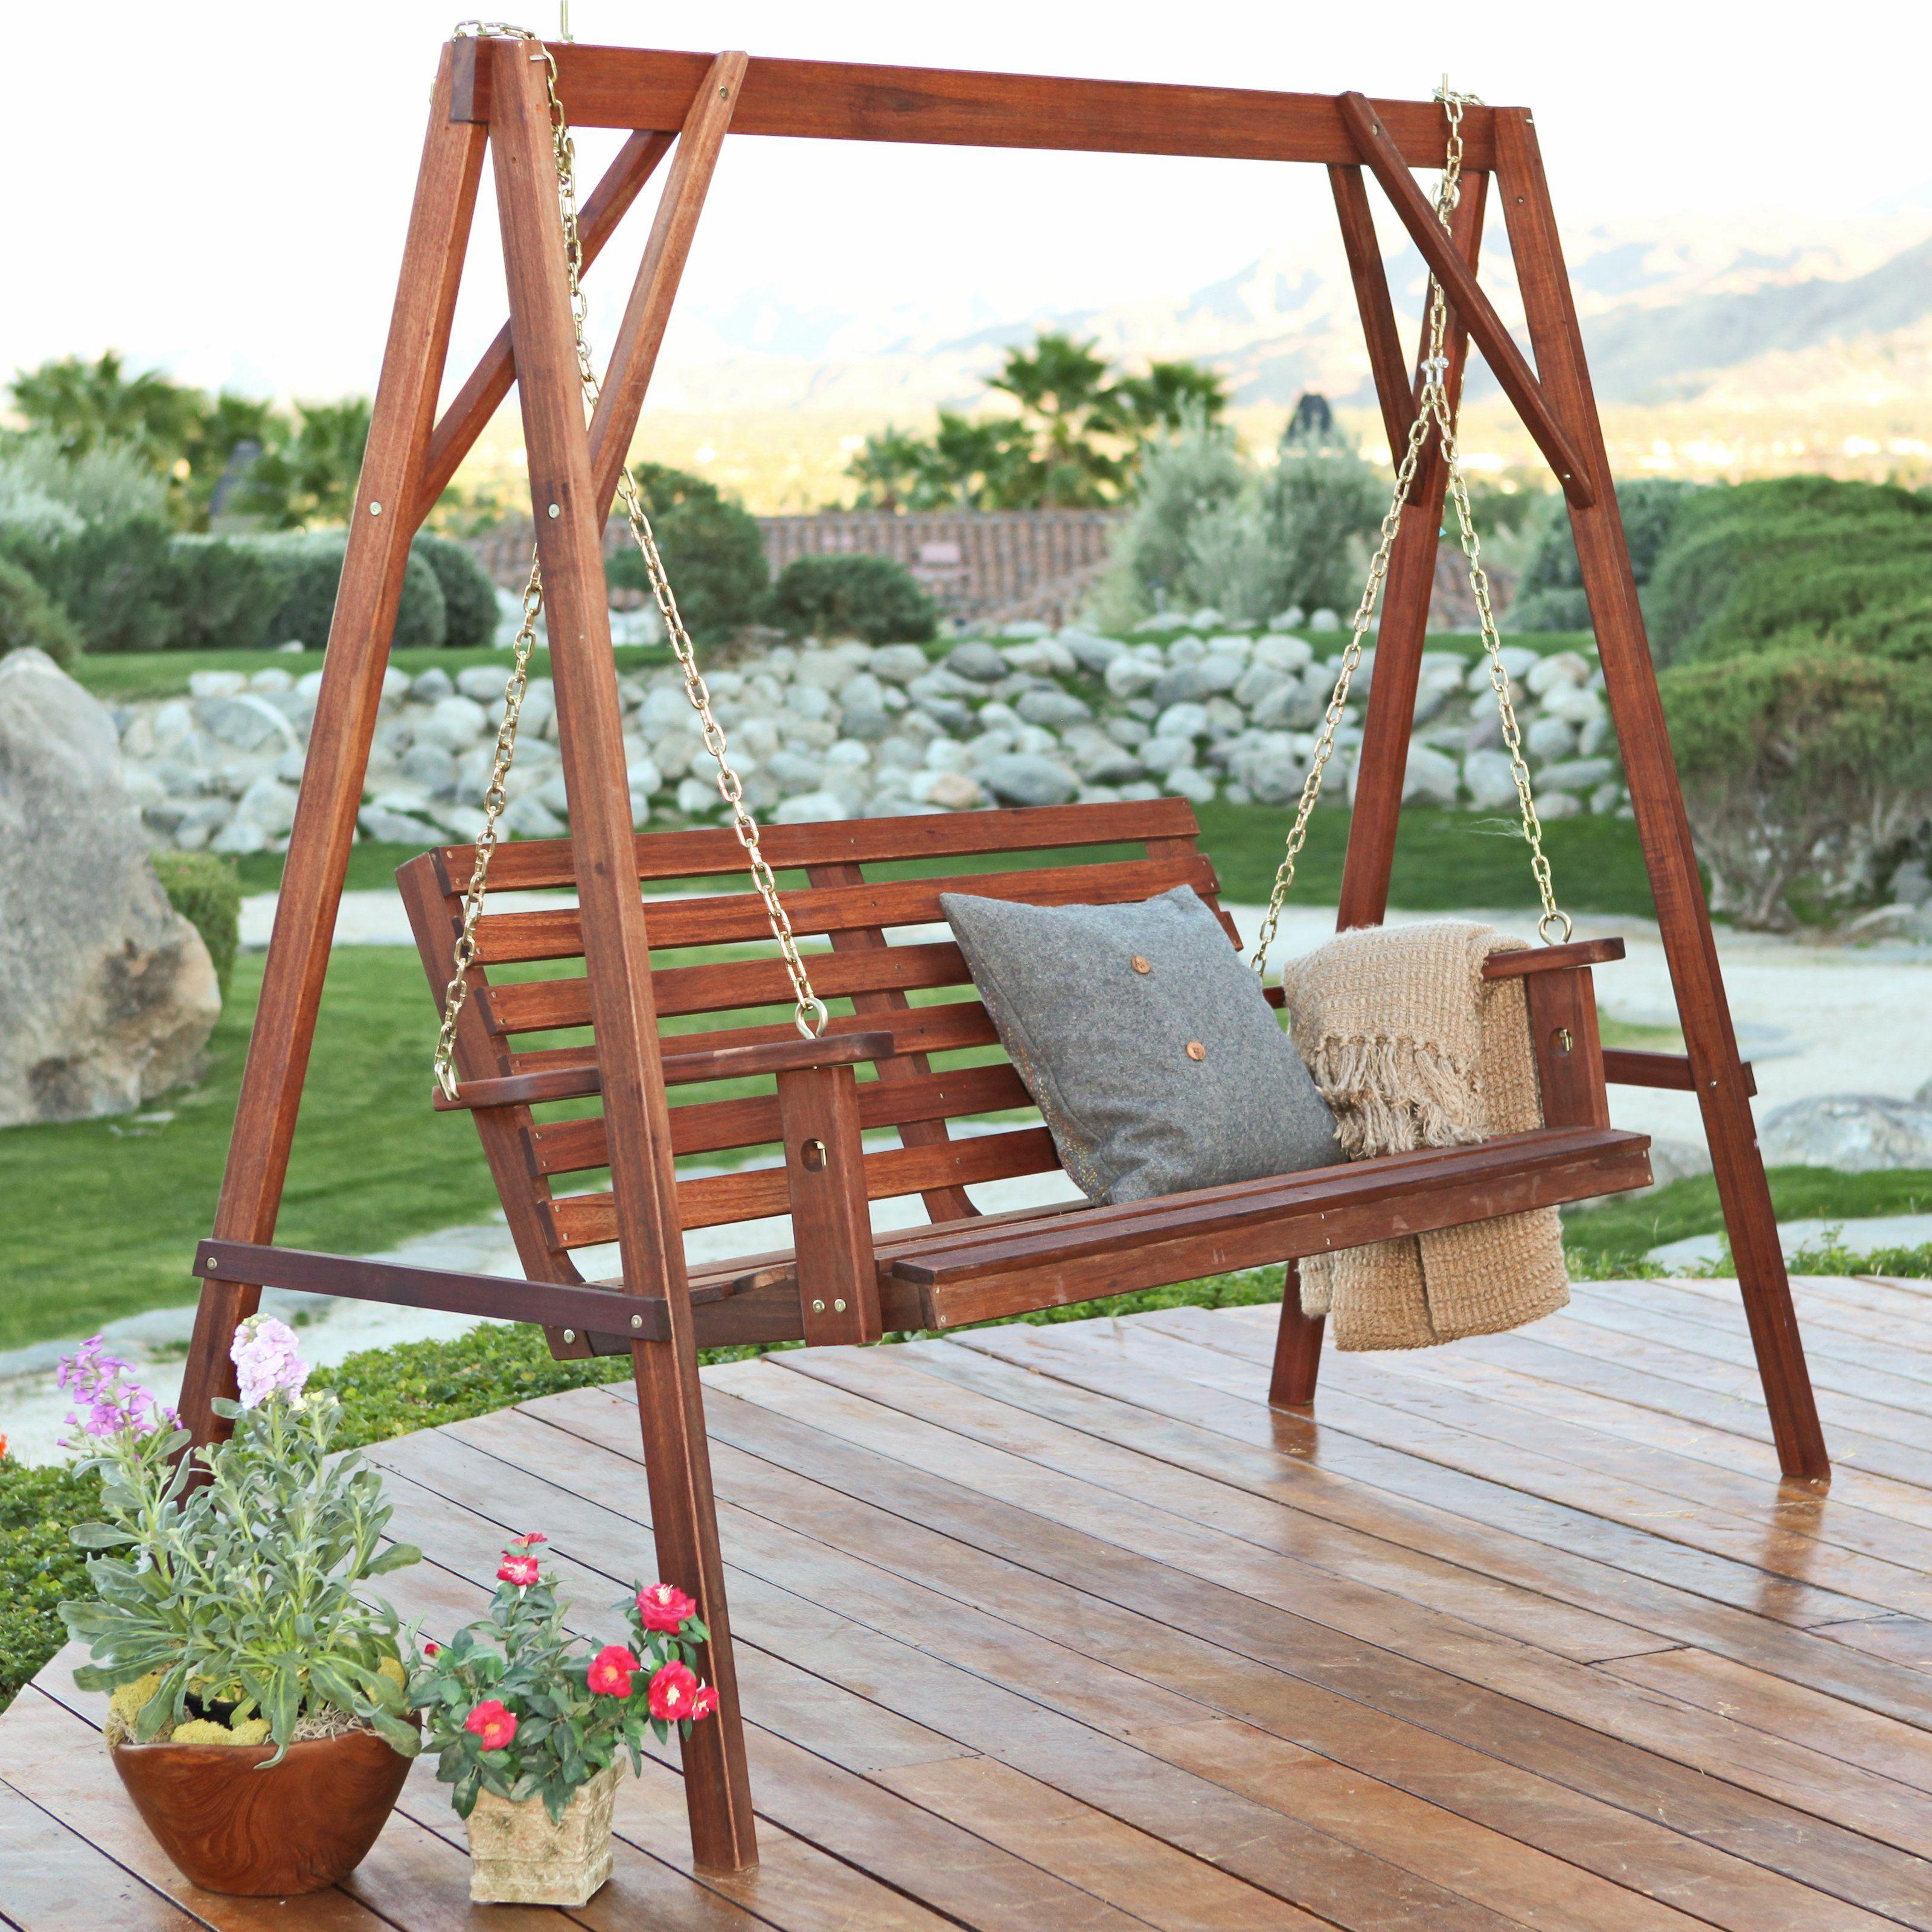 Belham Living Bay Ridge Porch Swing & Stand Set - Summer ... on Belham Living Richmond Bench id=12235